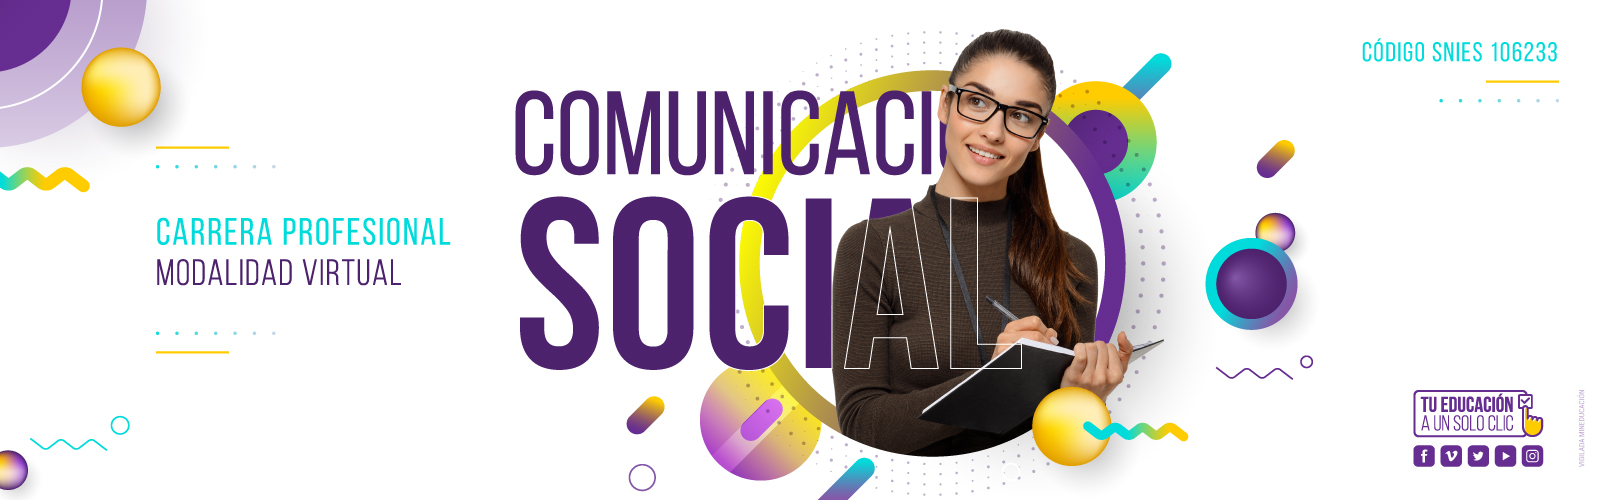 Banners-interno-social